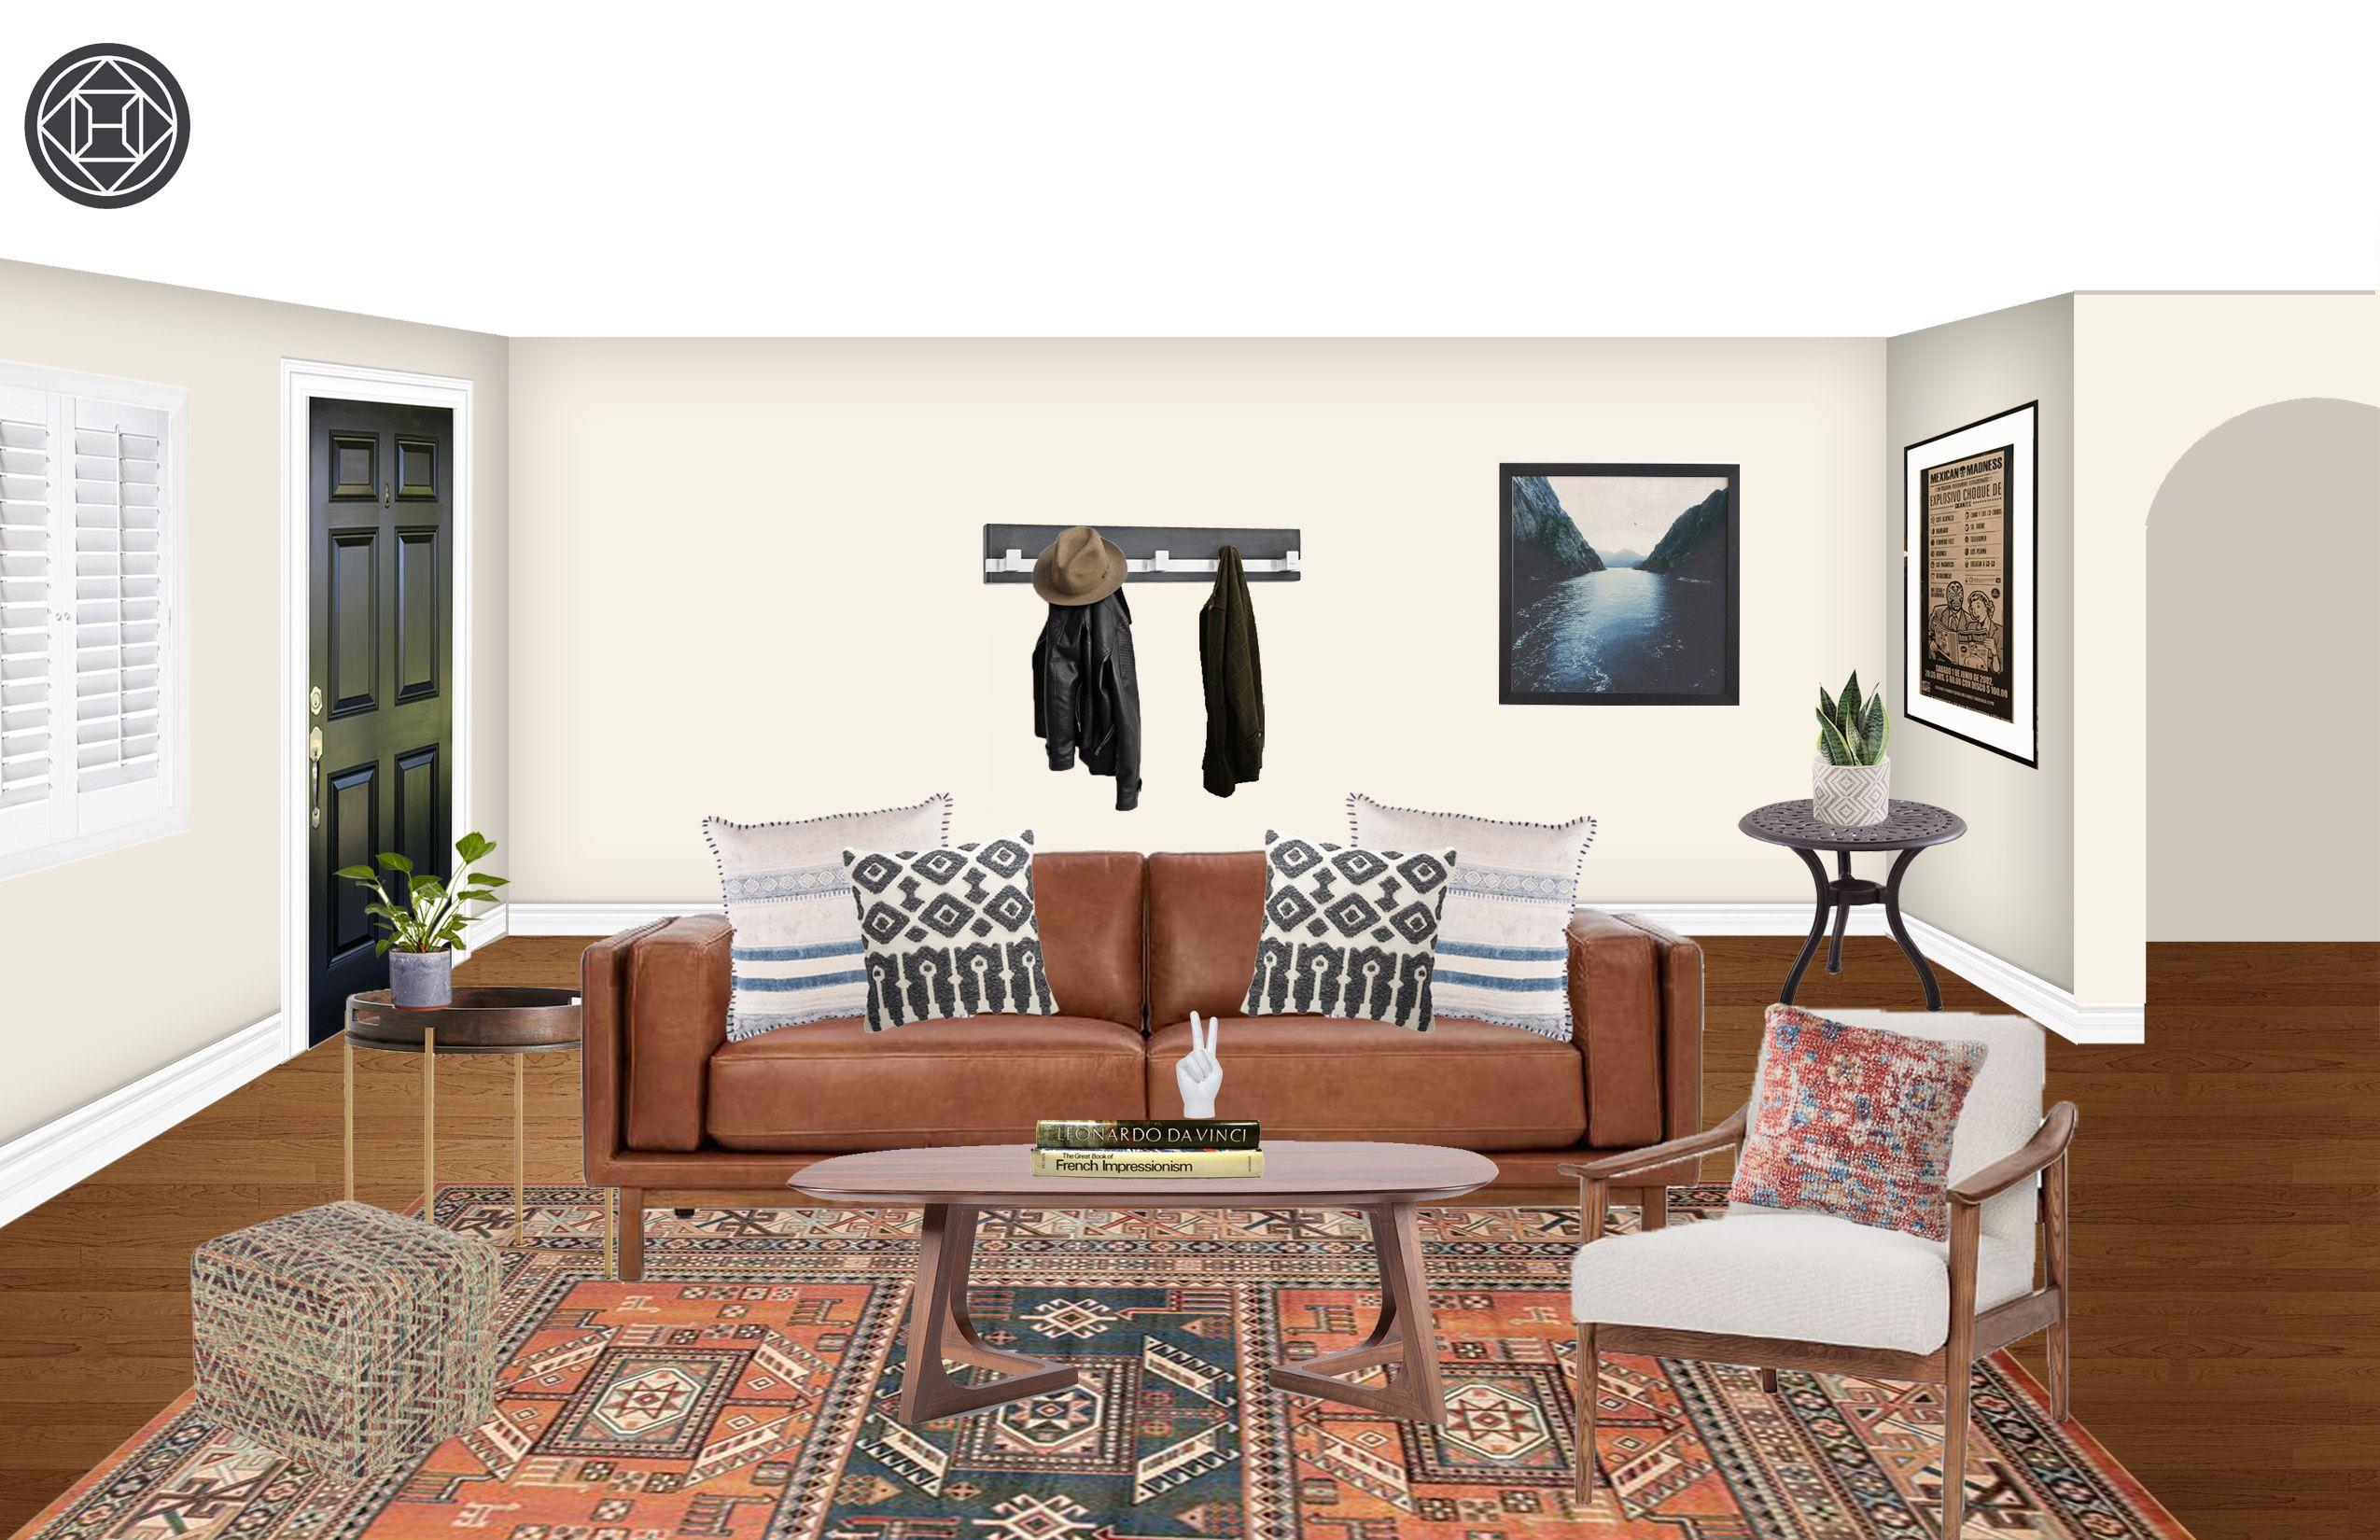 Best Eclectic Bohemian Midcentury Modern Living Room Design 400 x 300